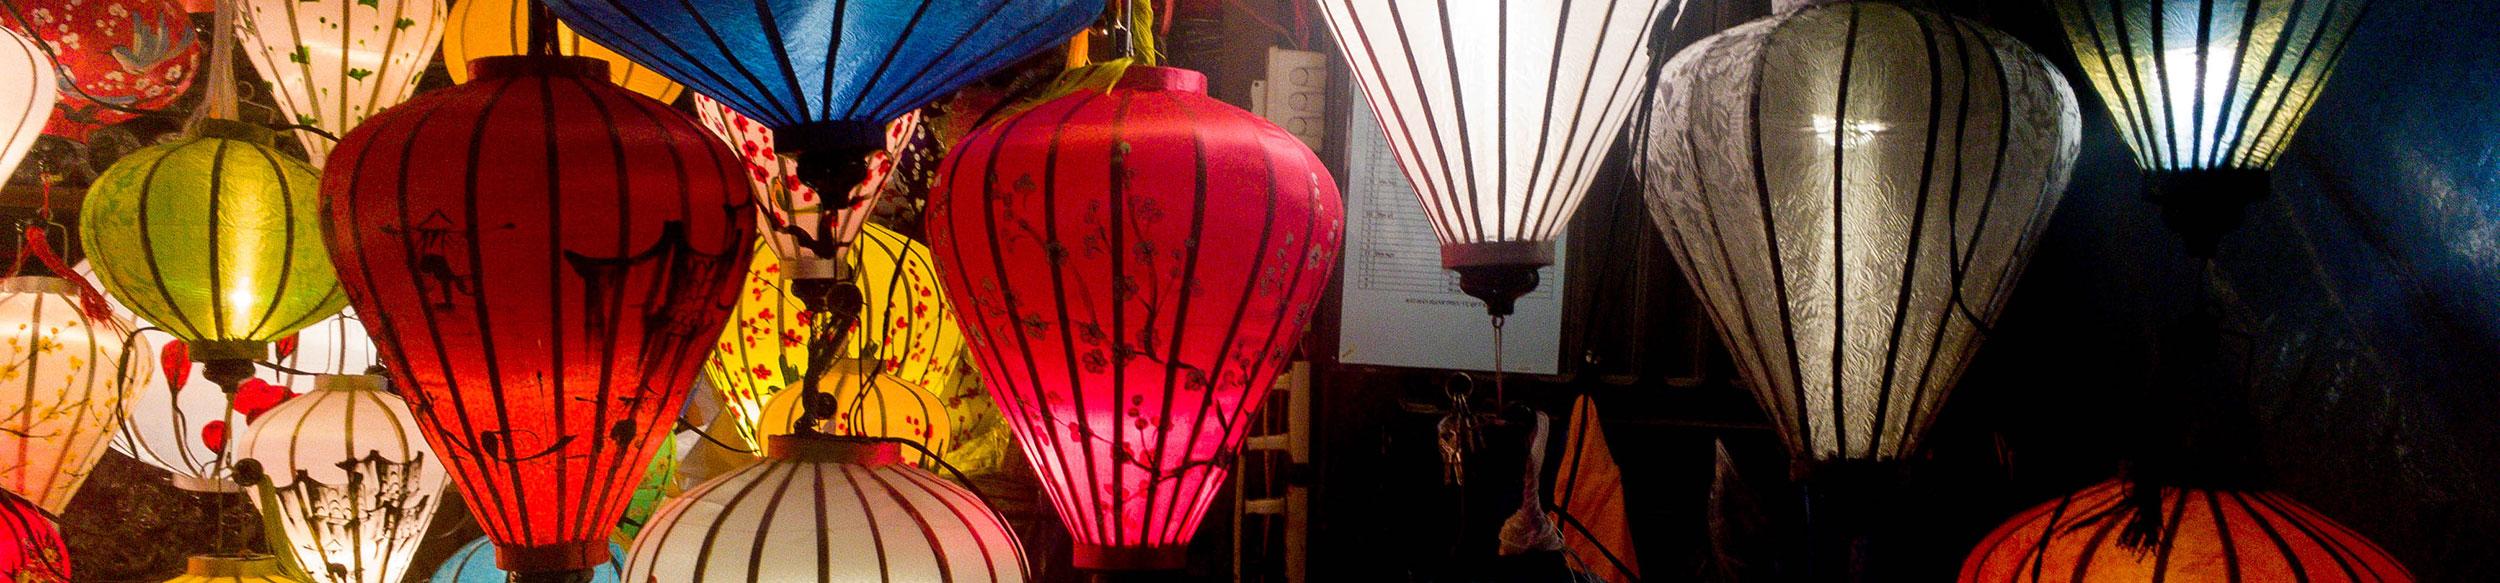 Lanterne de Hoi An